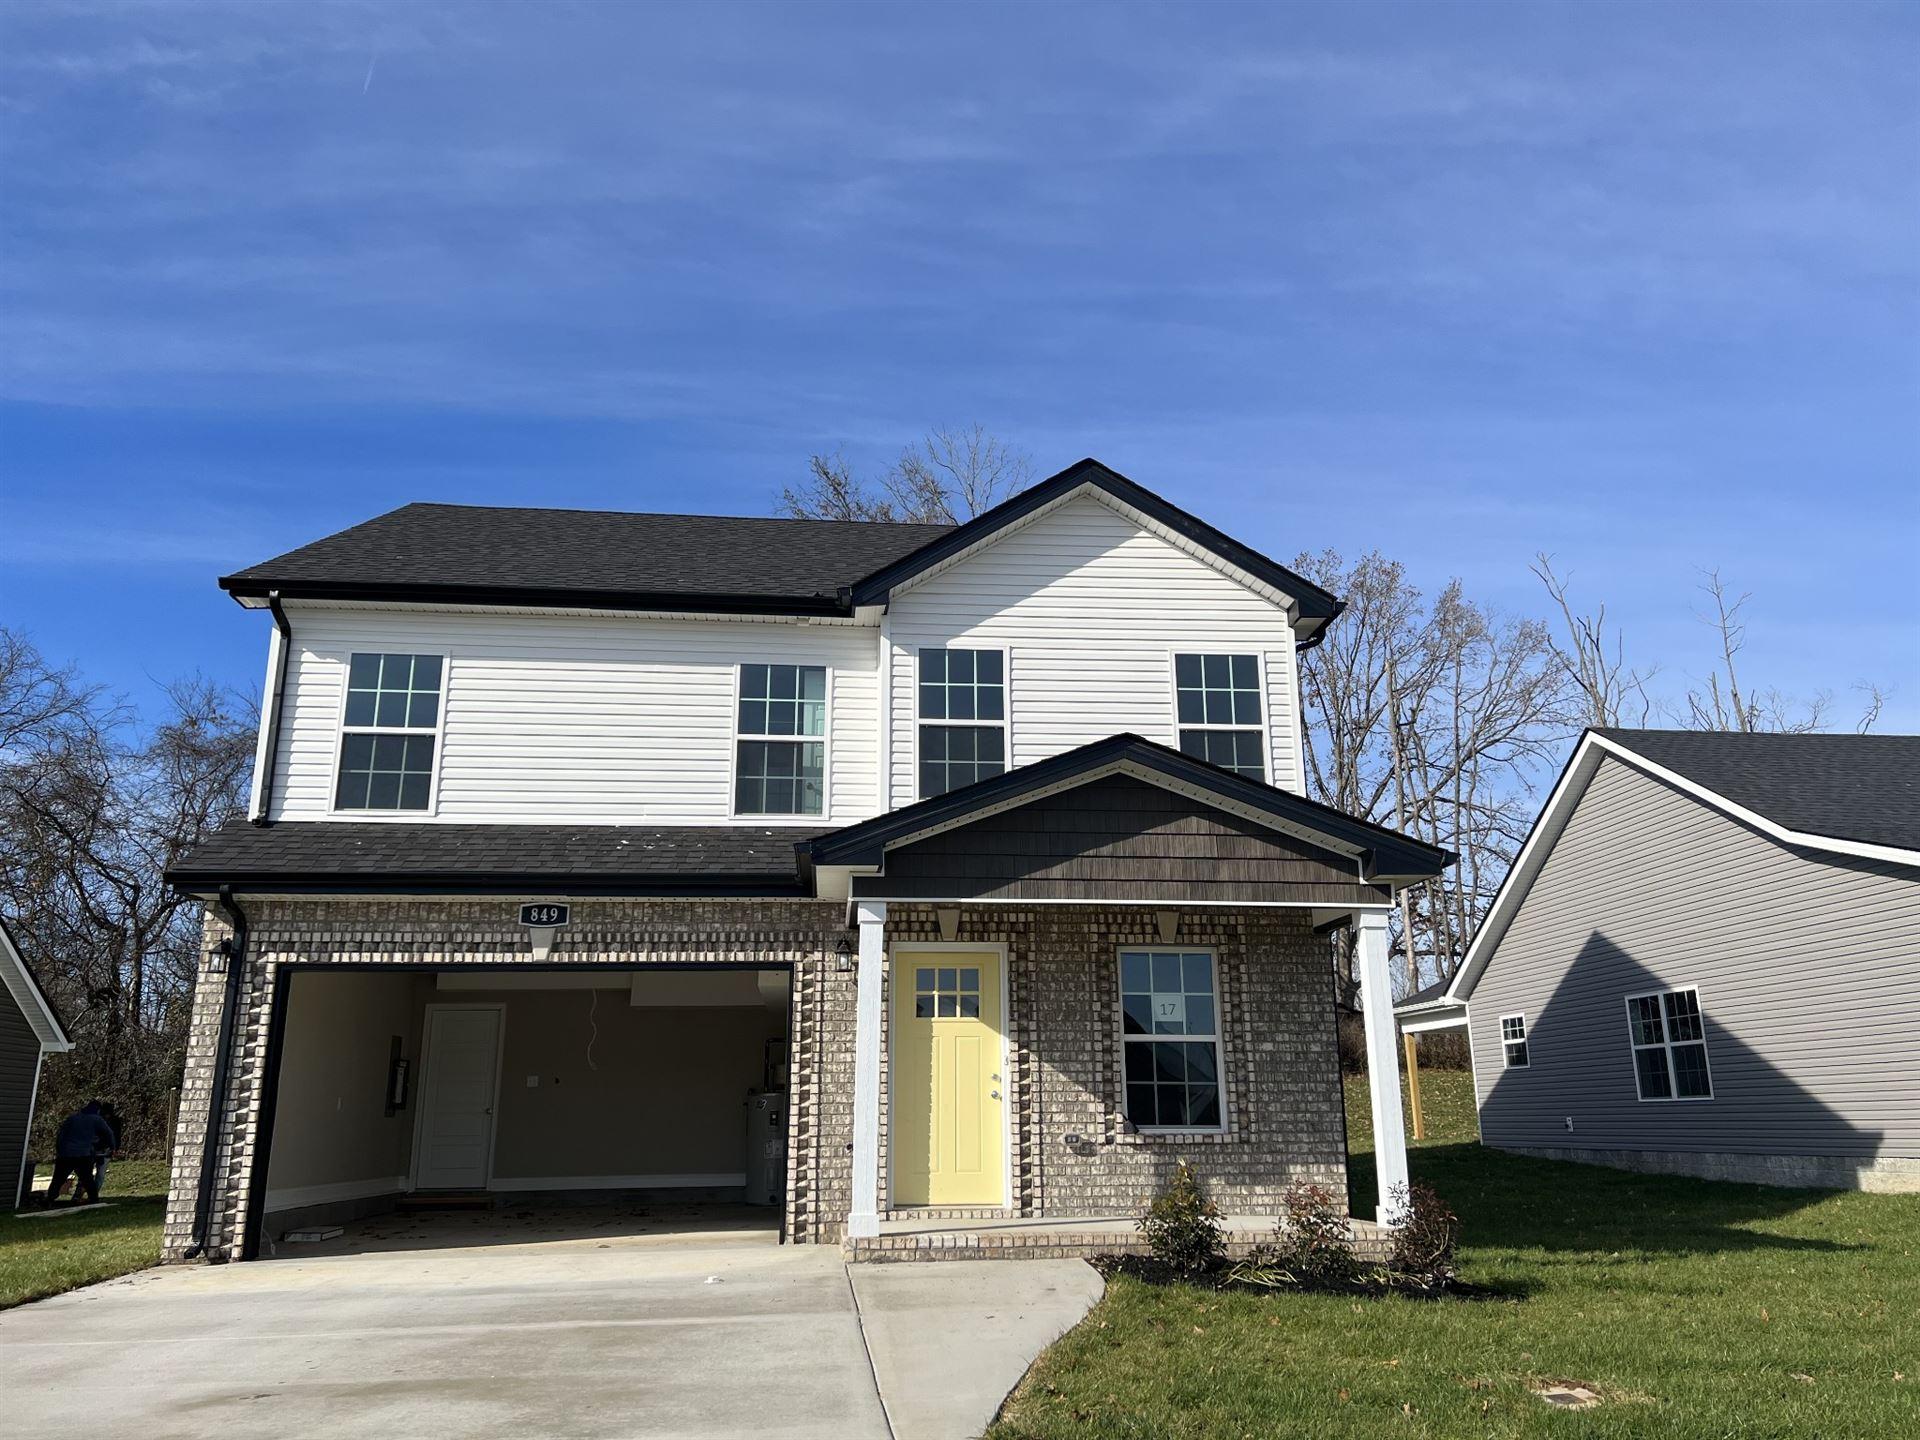 17 Irish Hills, Clarksville, TN 37042 - MLS#: 2274563